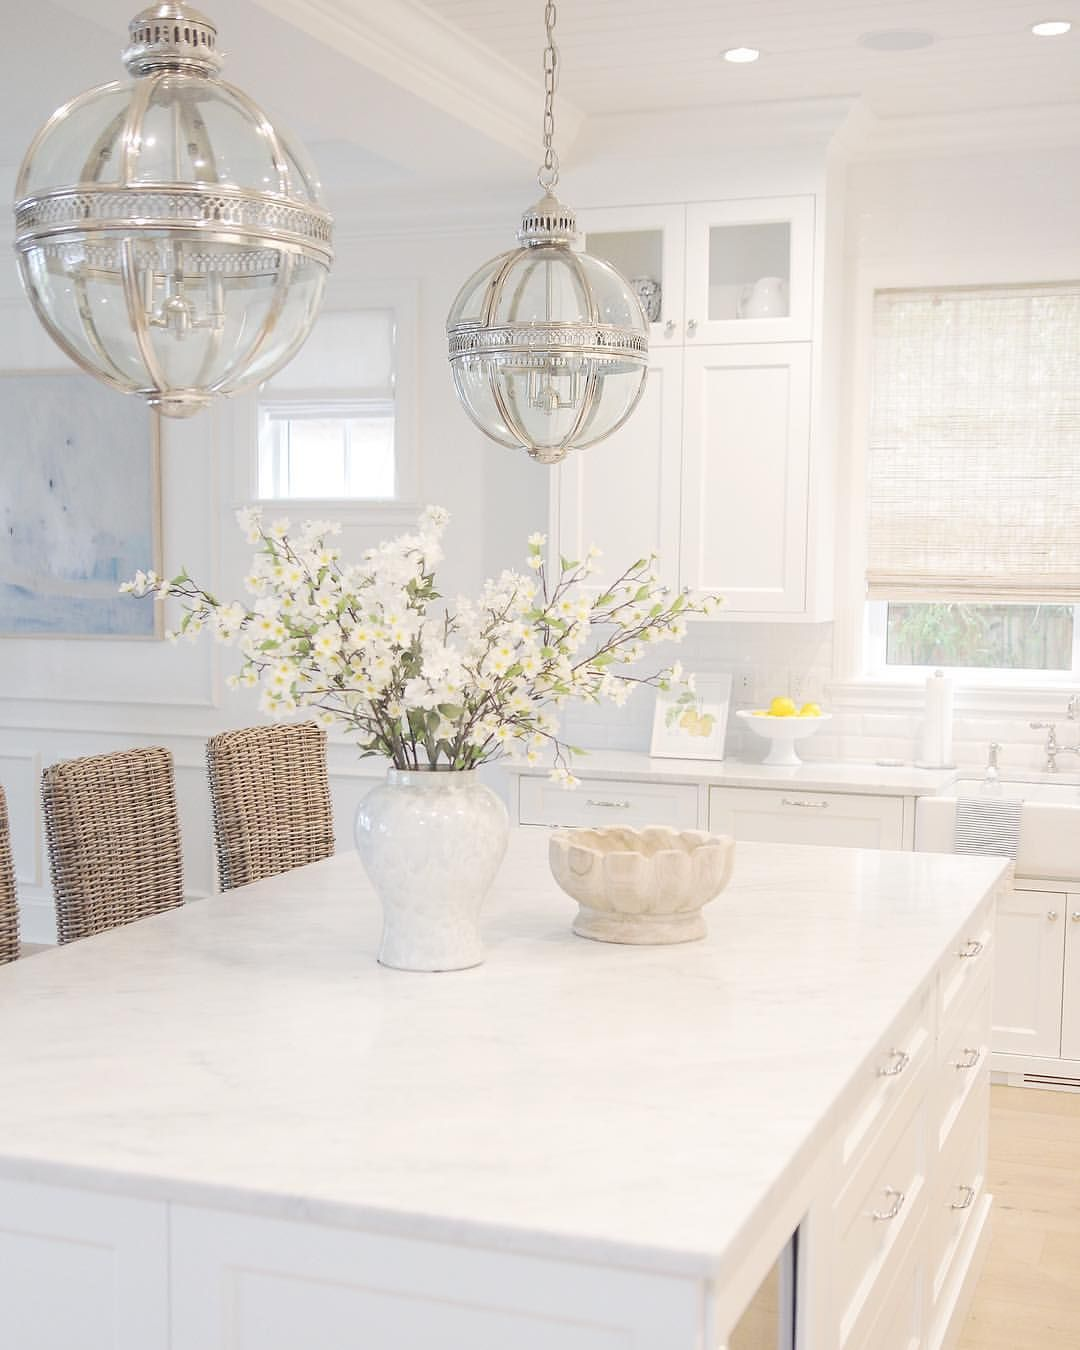 White Kitchen. Carrara Marble. Bamboo Roman Shades. Rattan